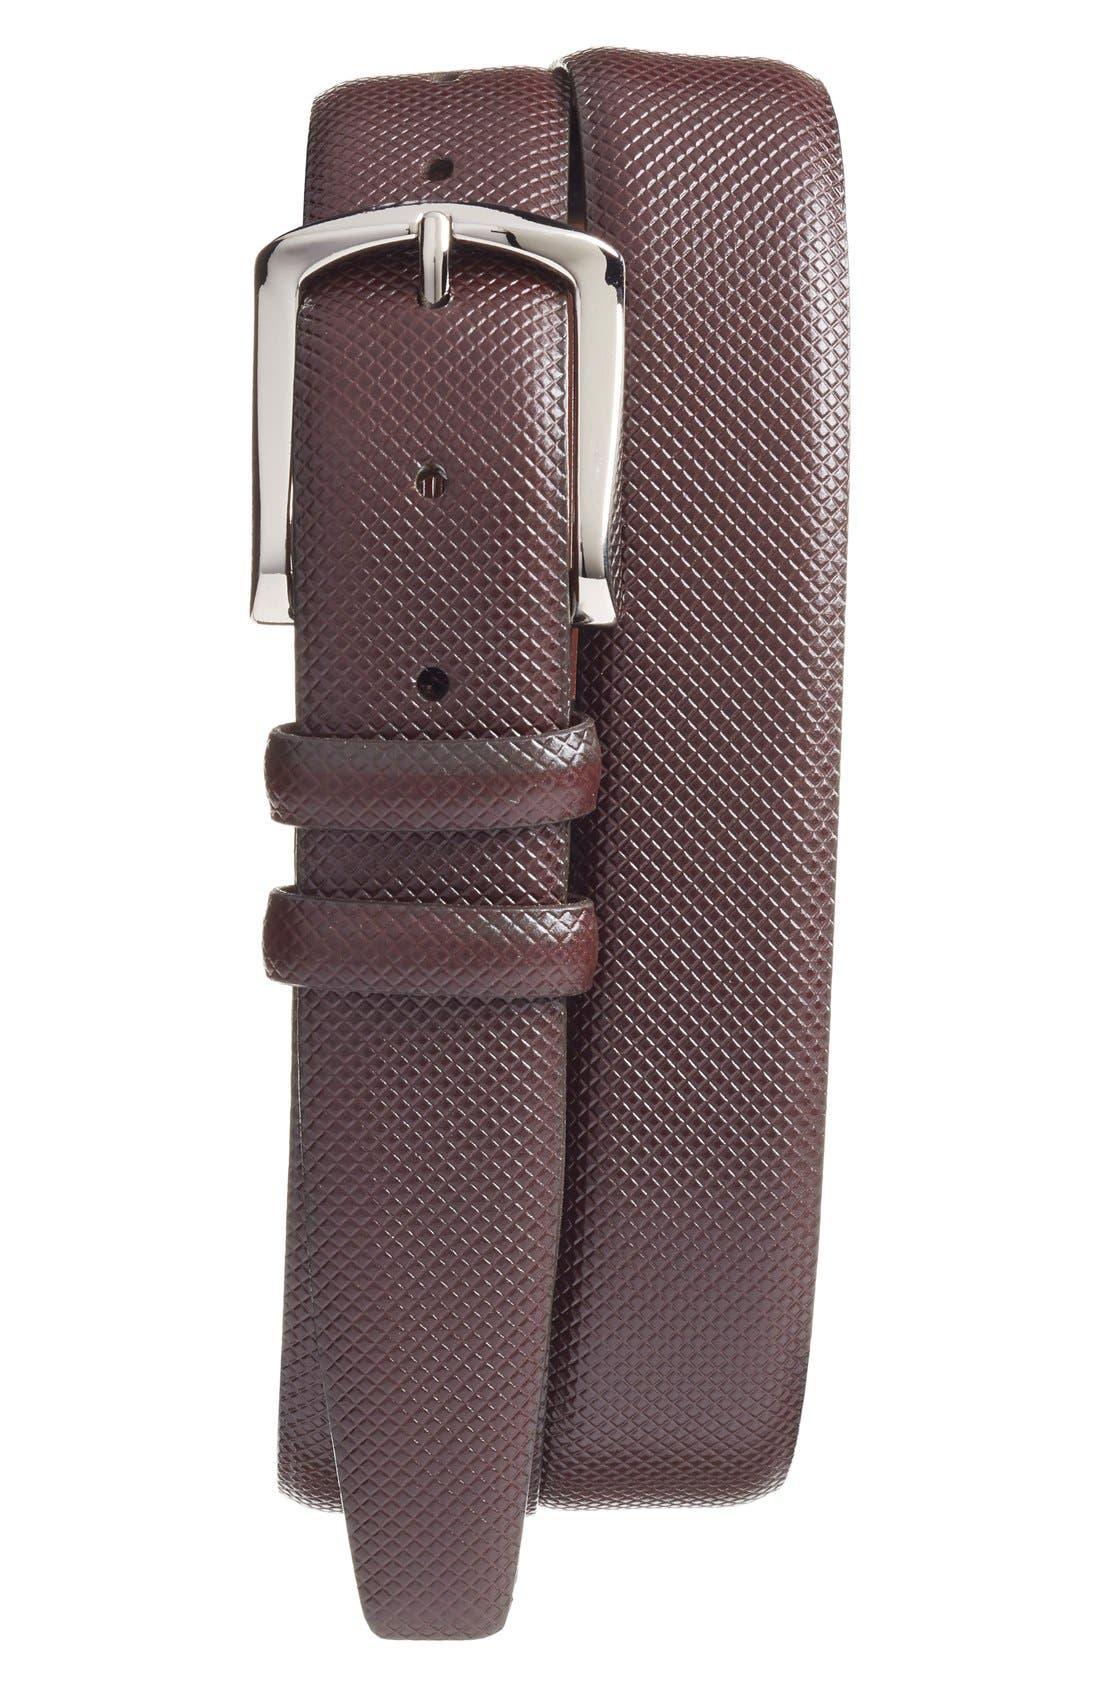 Alternate Image 1 Selected - Torino Belts Bulgaro Calfskin Leather Belt